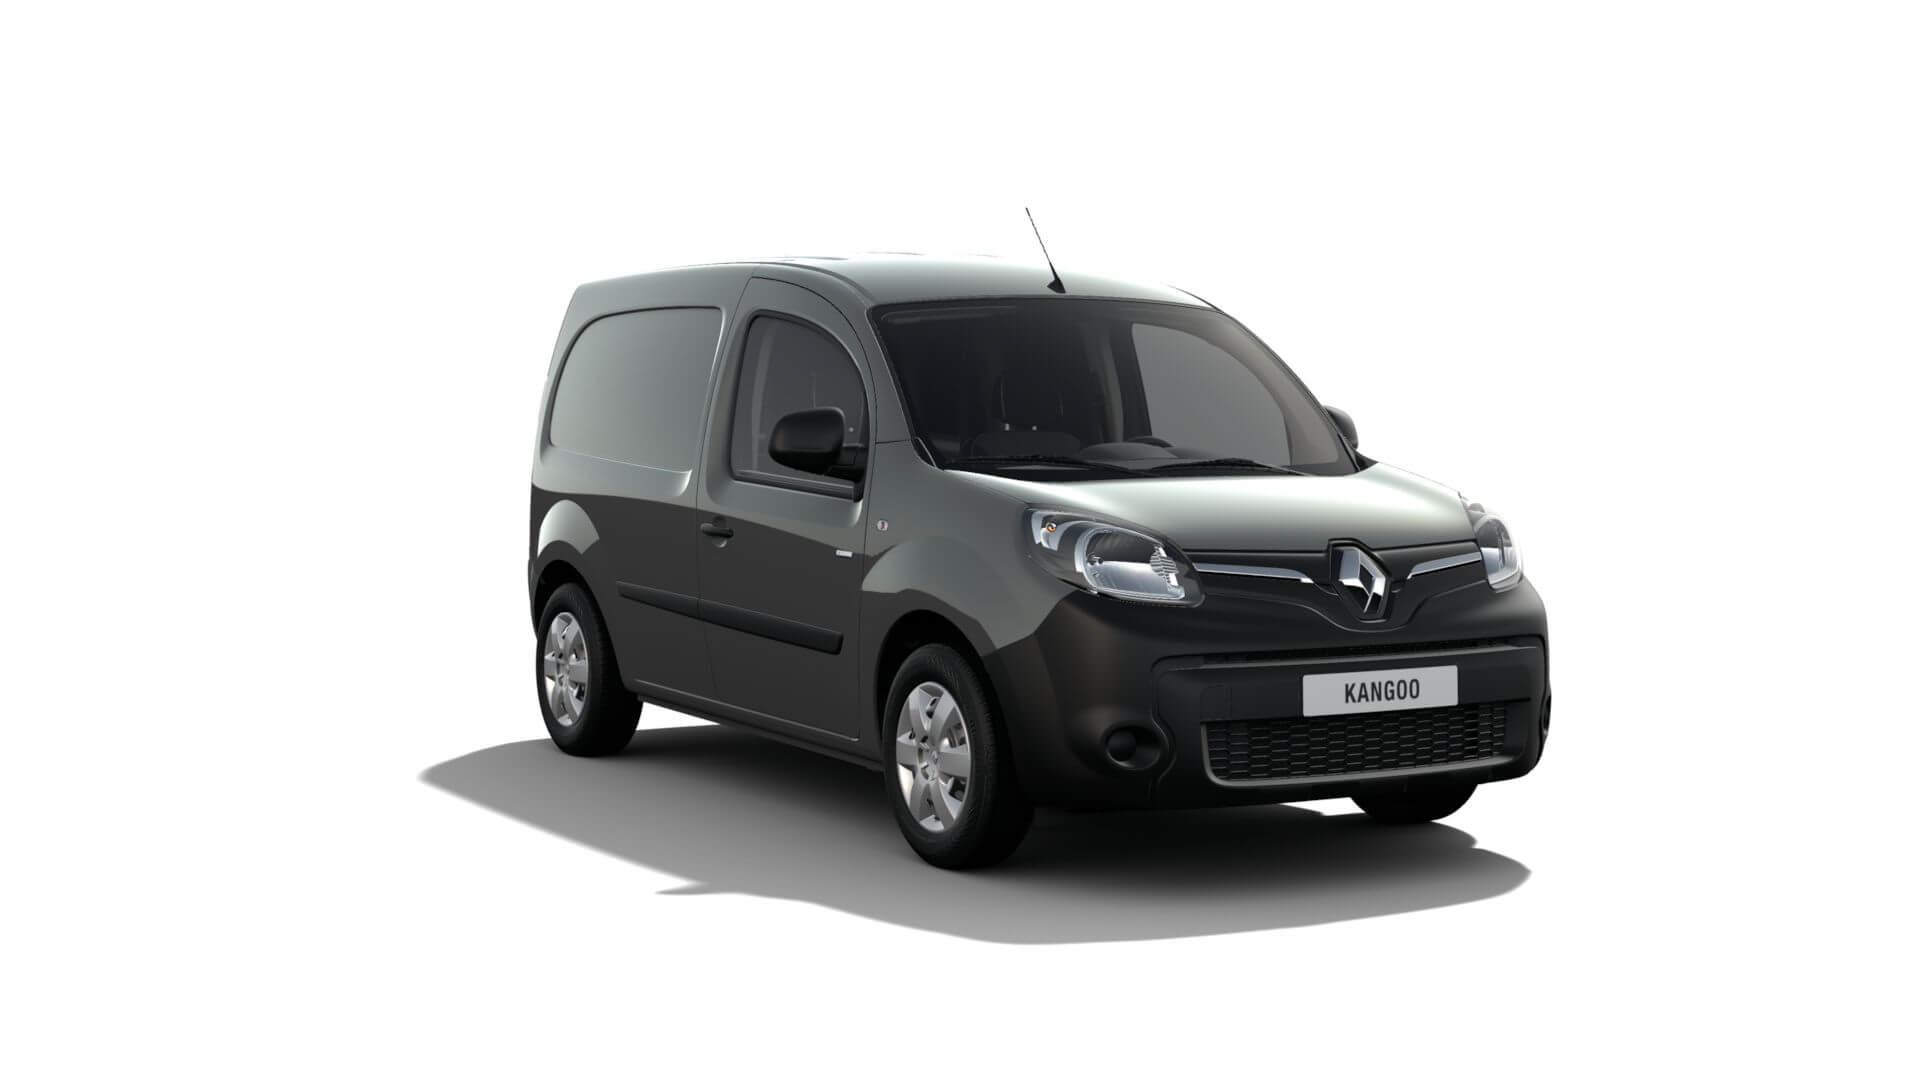 Automodell dunkelgrau - Renault Kangoo NFZ - Renault Ahrens Hannover